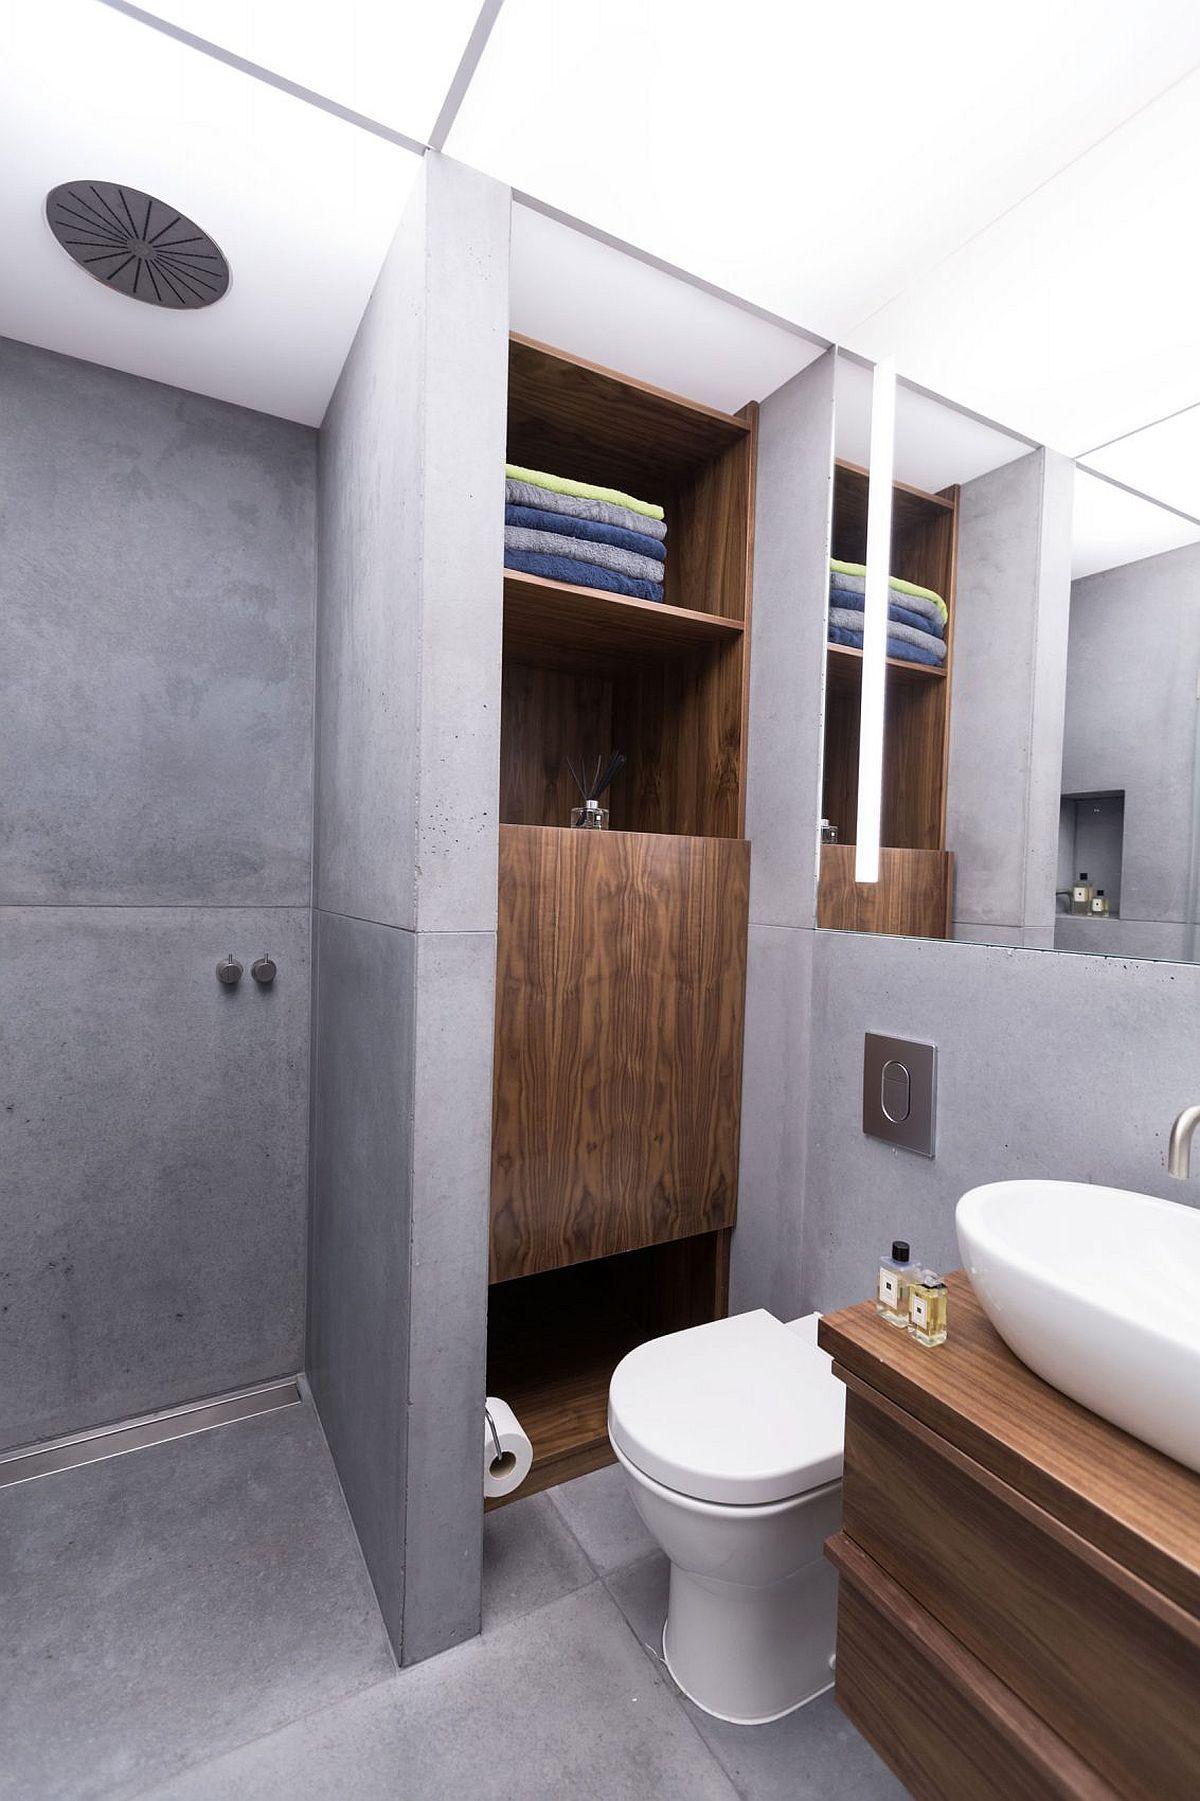 Small bathroom storage and display idea